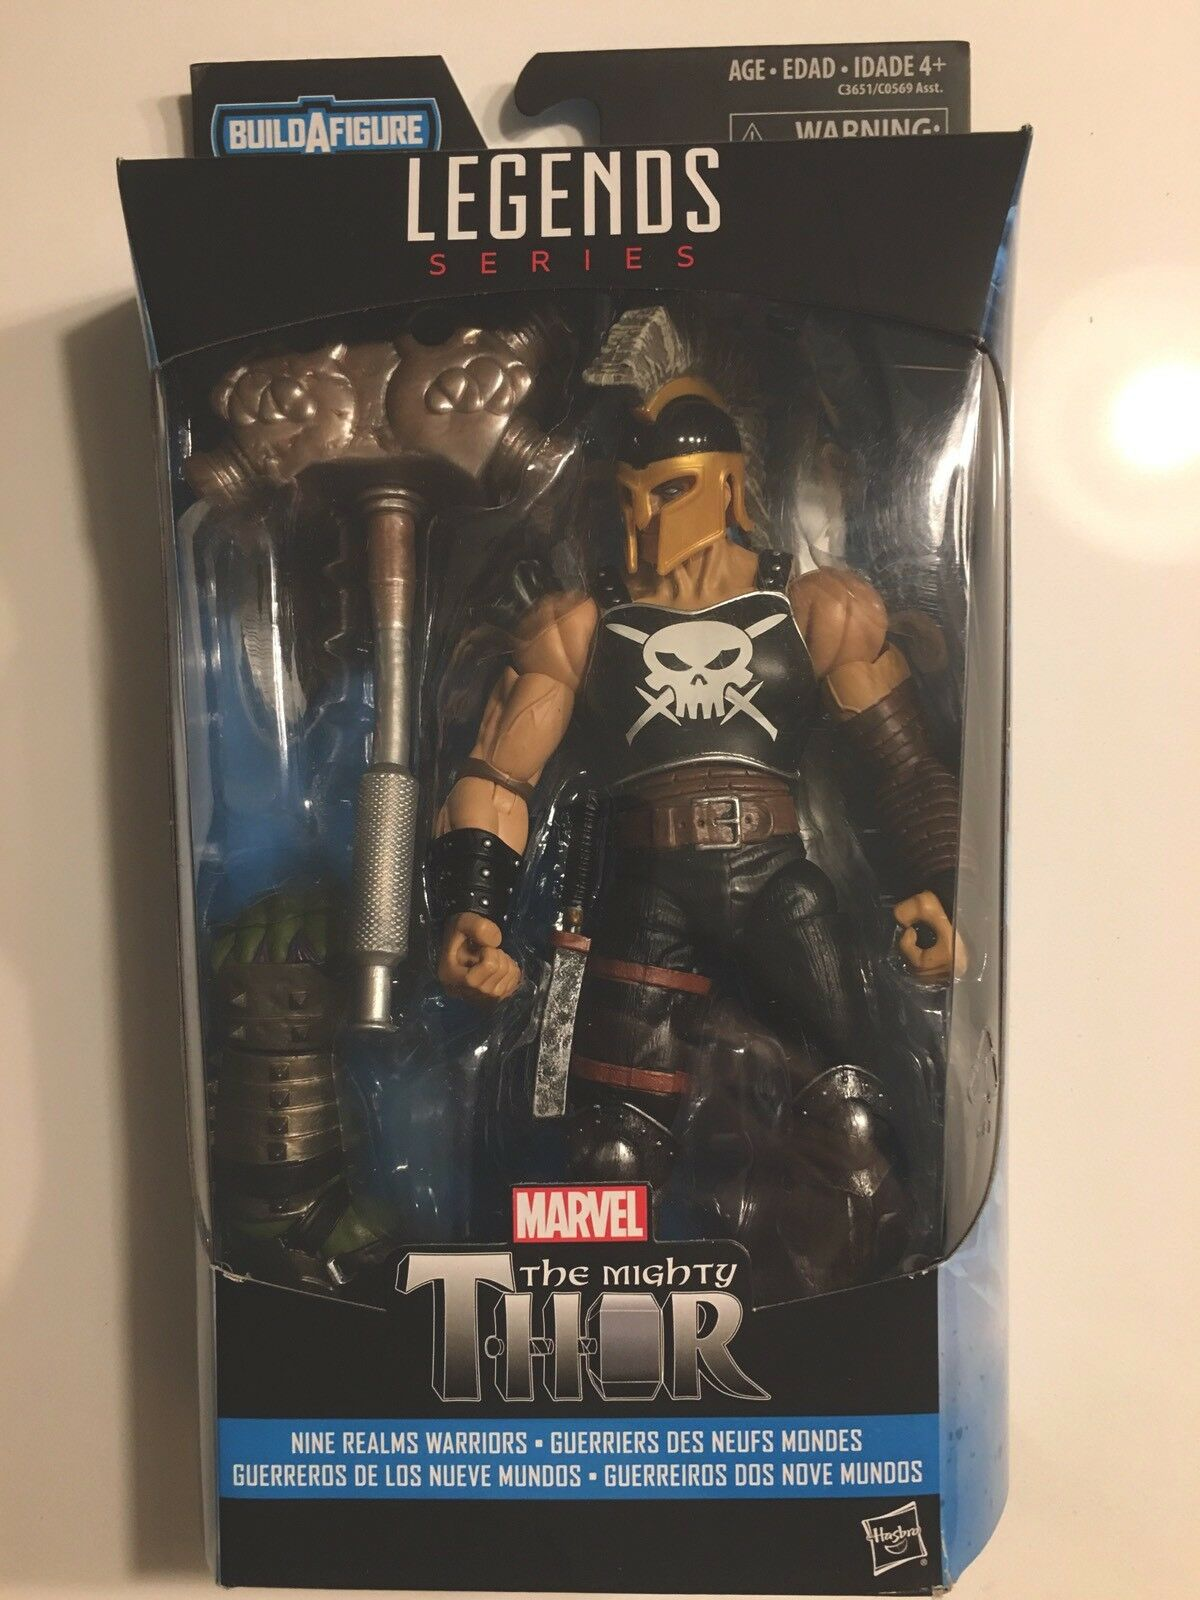 Marvel Legends ARES THOR Ragnarok HULK BAF Infinity War Deadpool X-Men Lot NEW